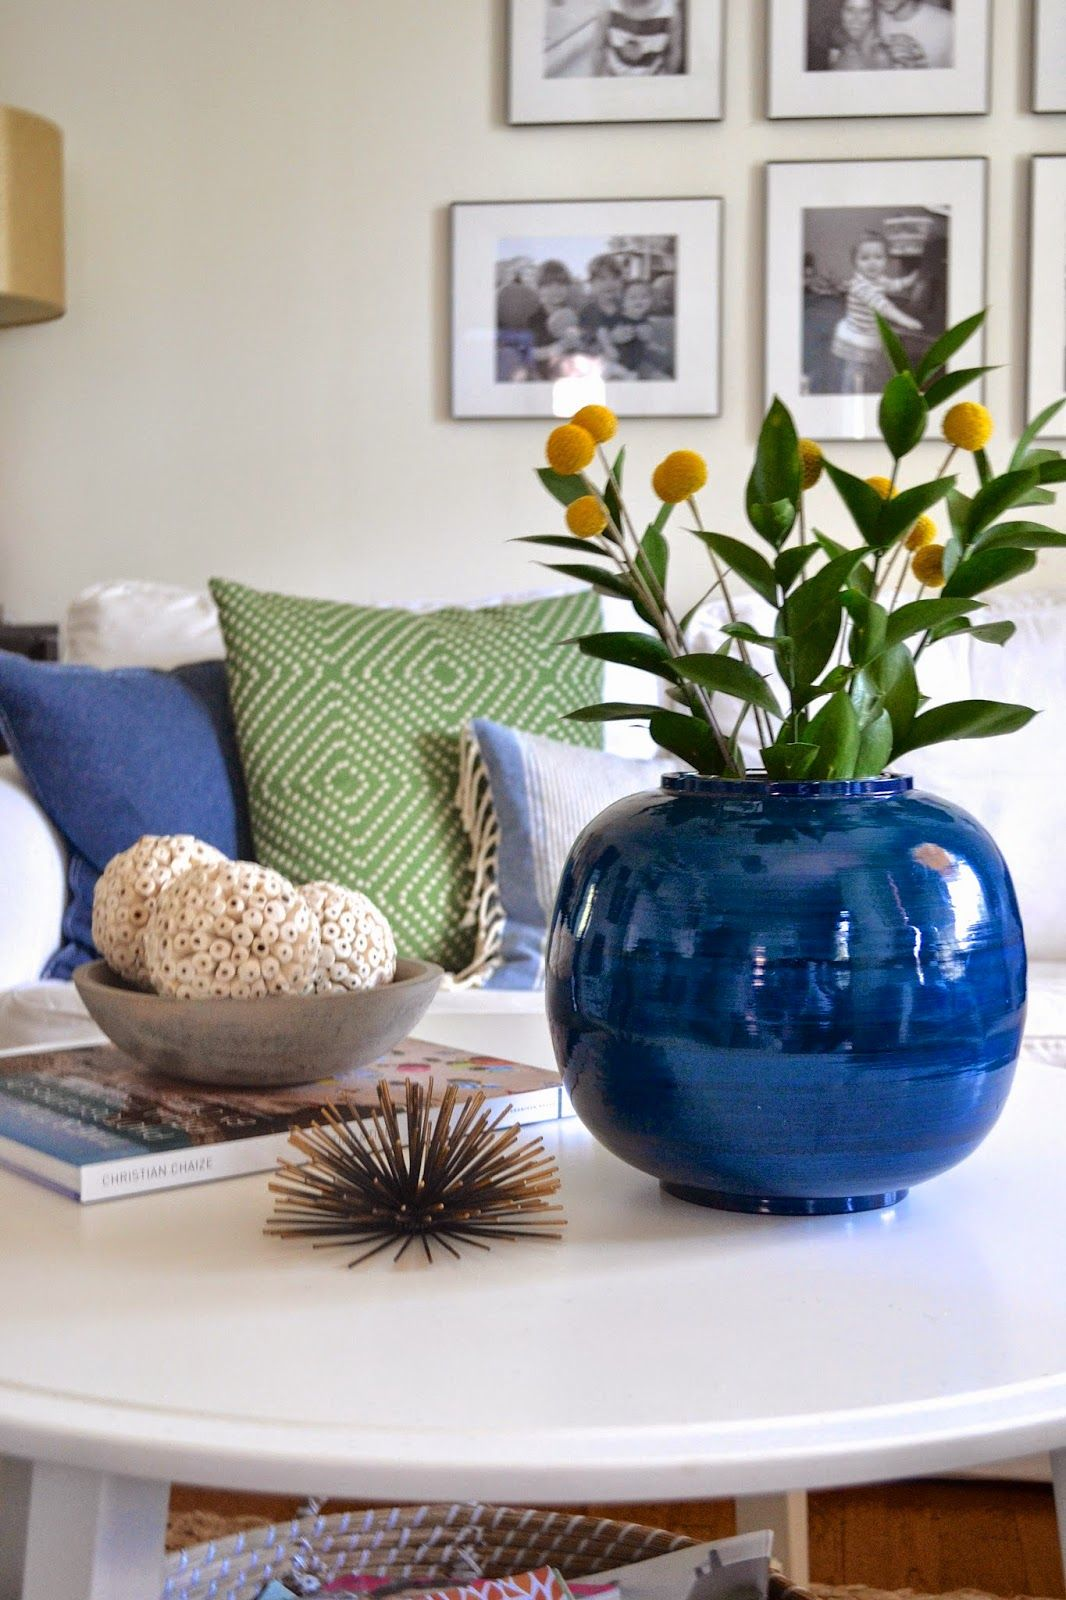 How To Style A Vignette Home Decor Inspiration Decor Home Decor